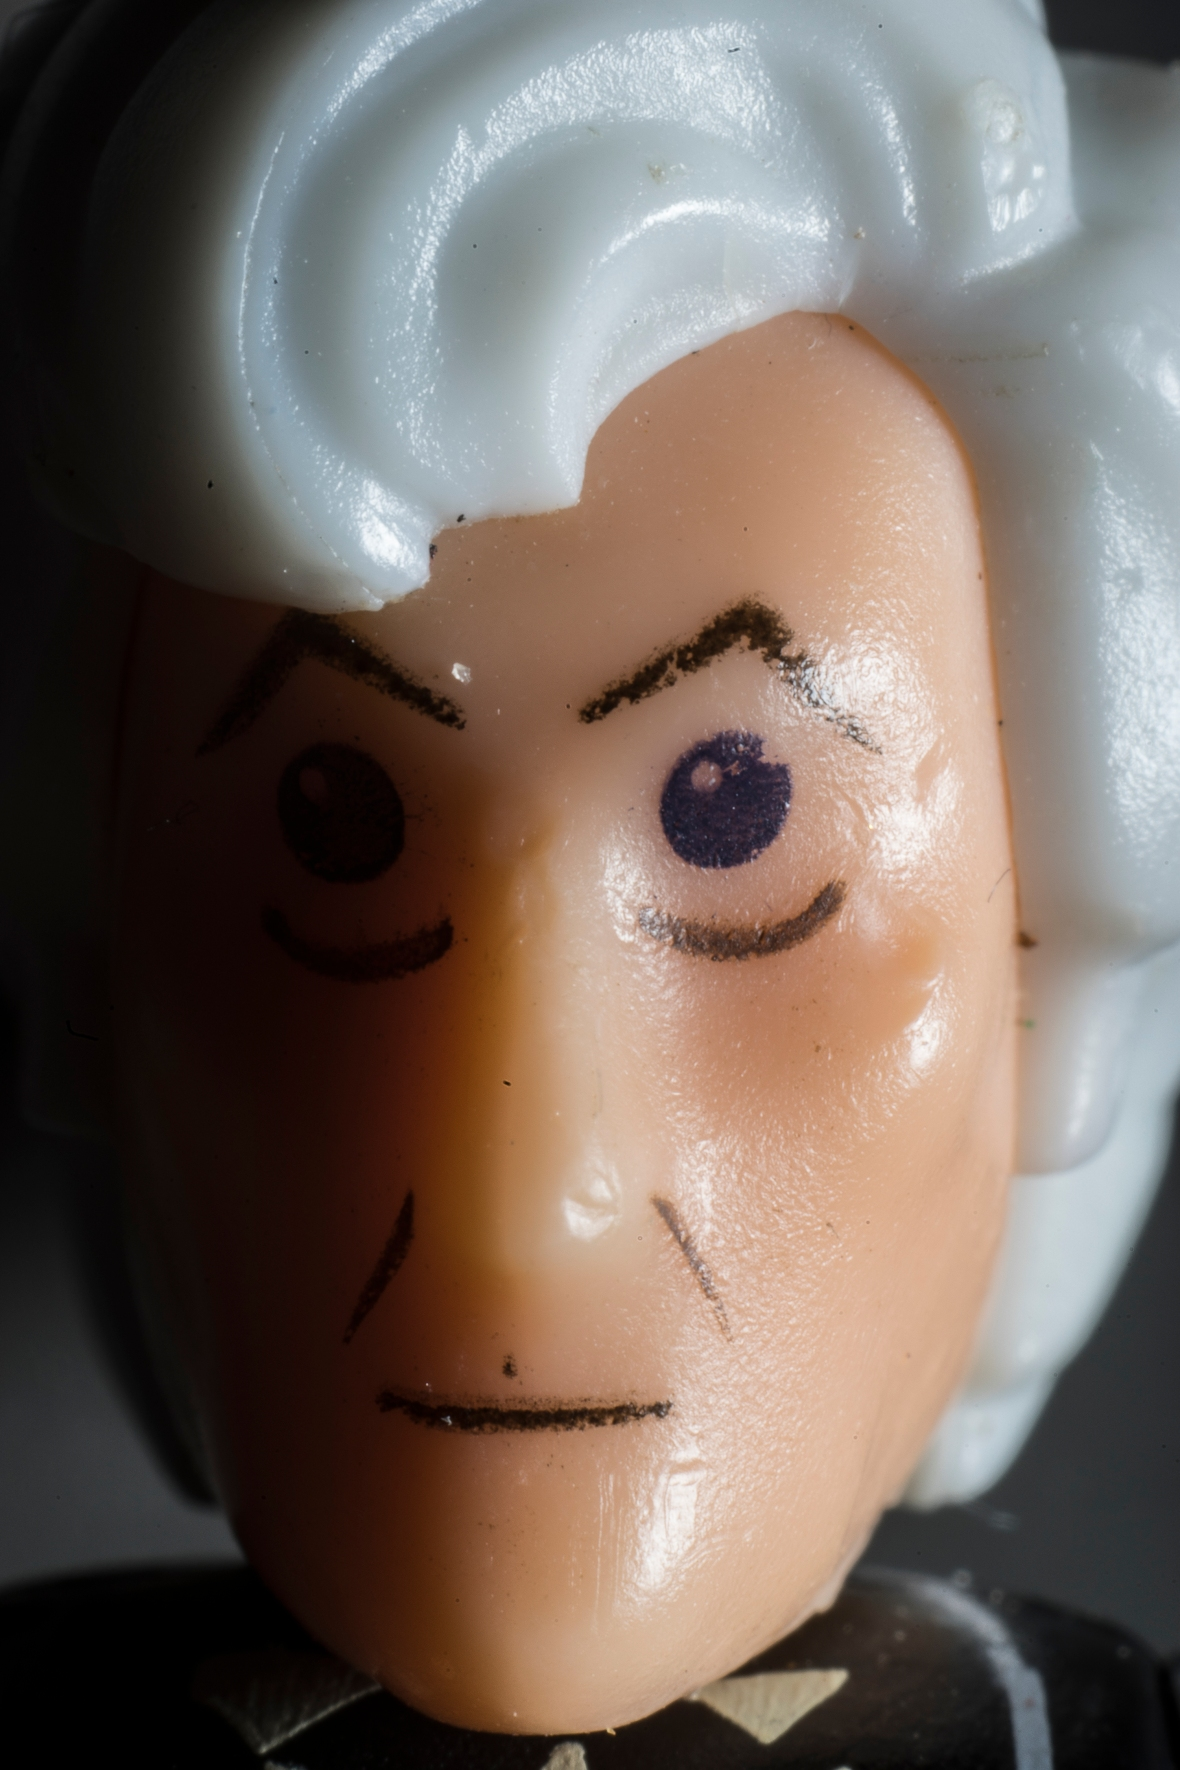 Portrait of a tiny Dr Who figure